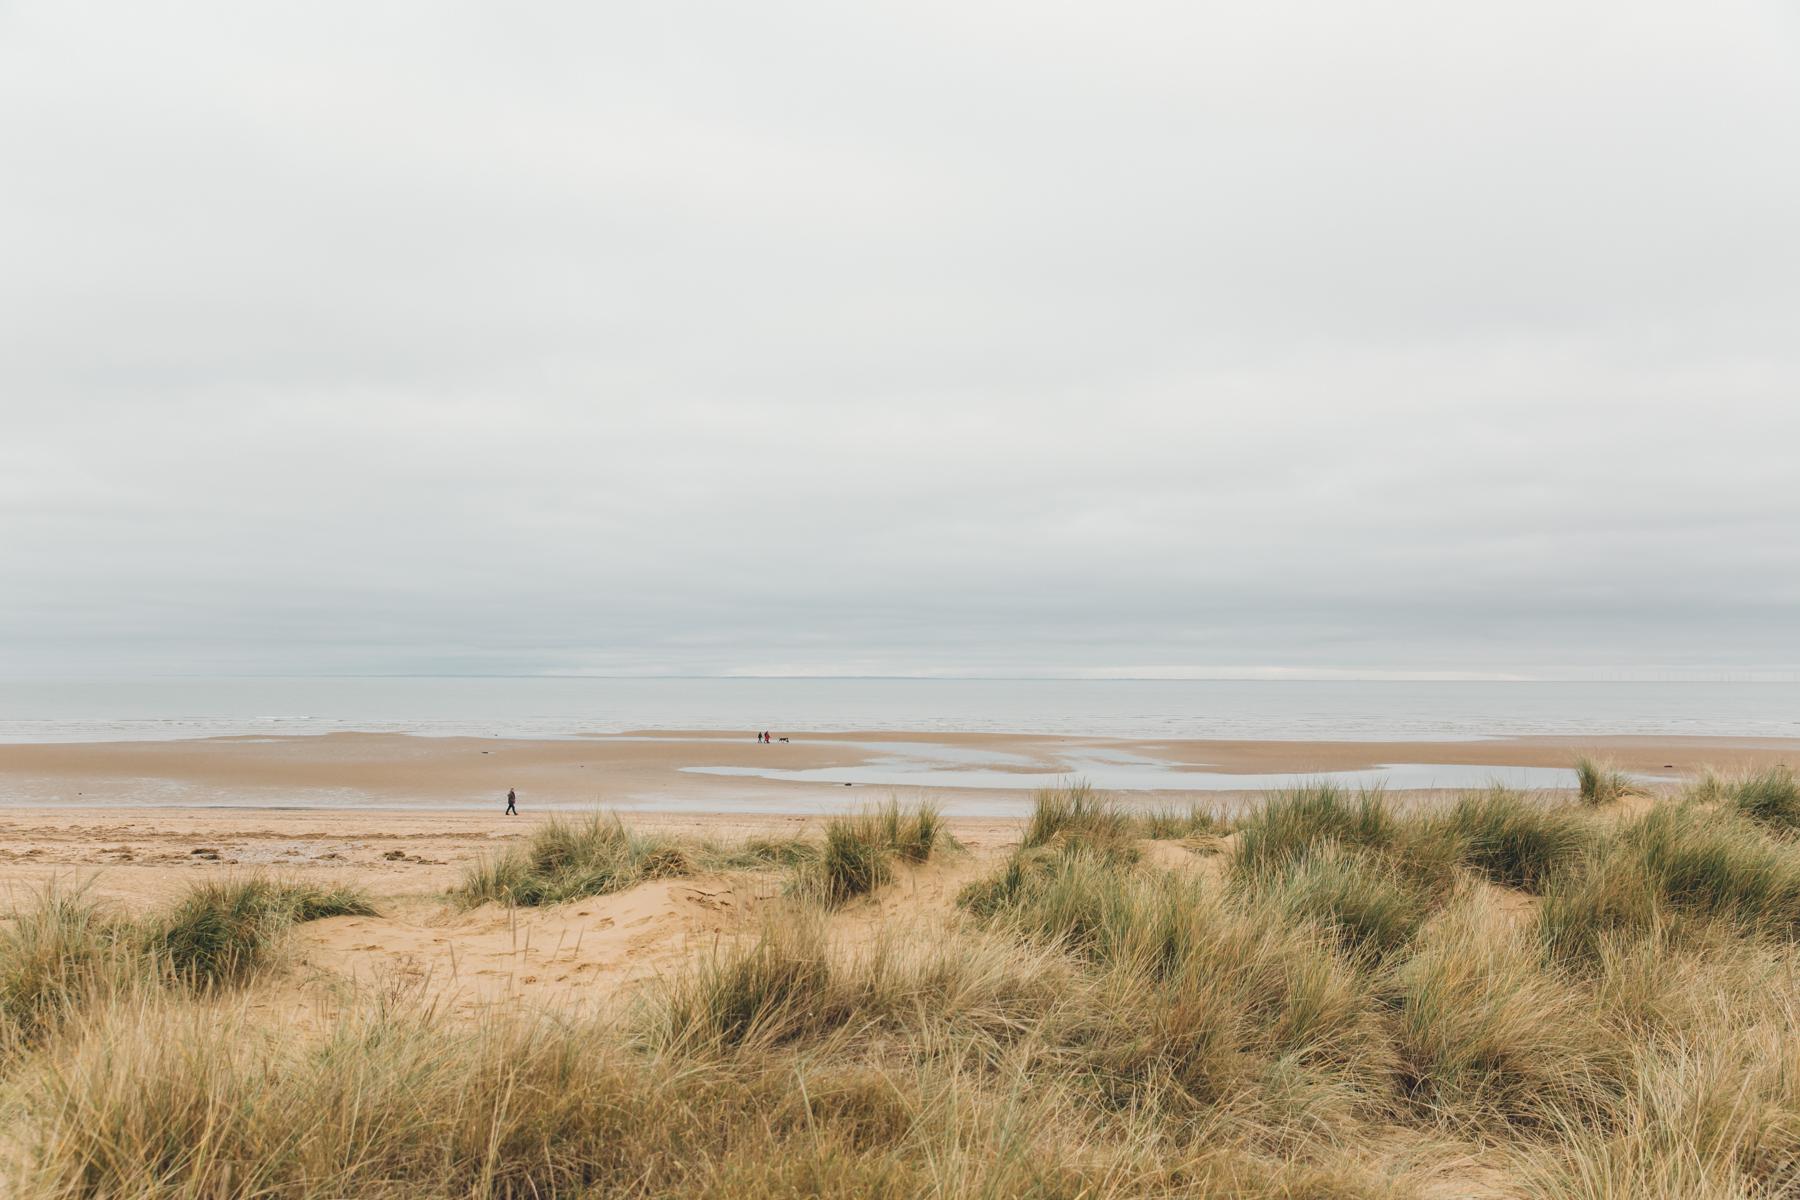 Old Hunstanton beach on the North Norfolk coast.